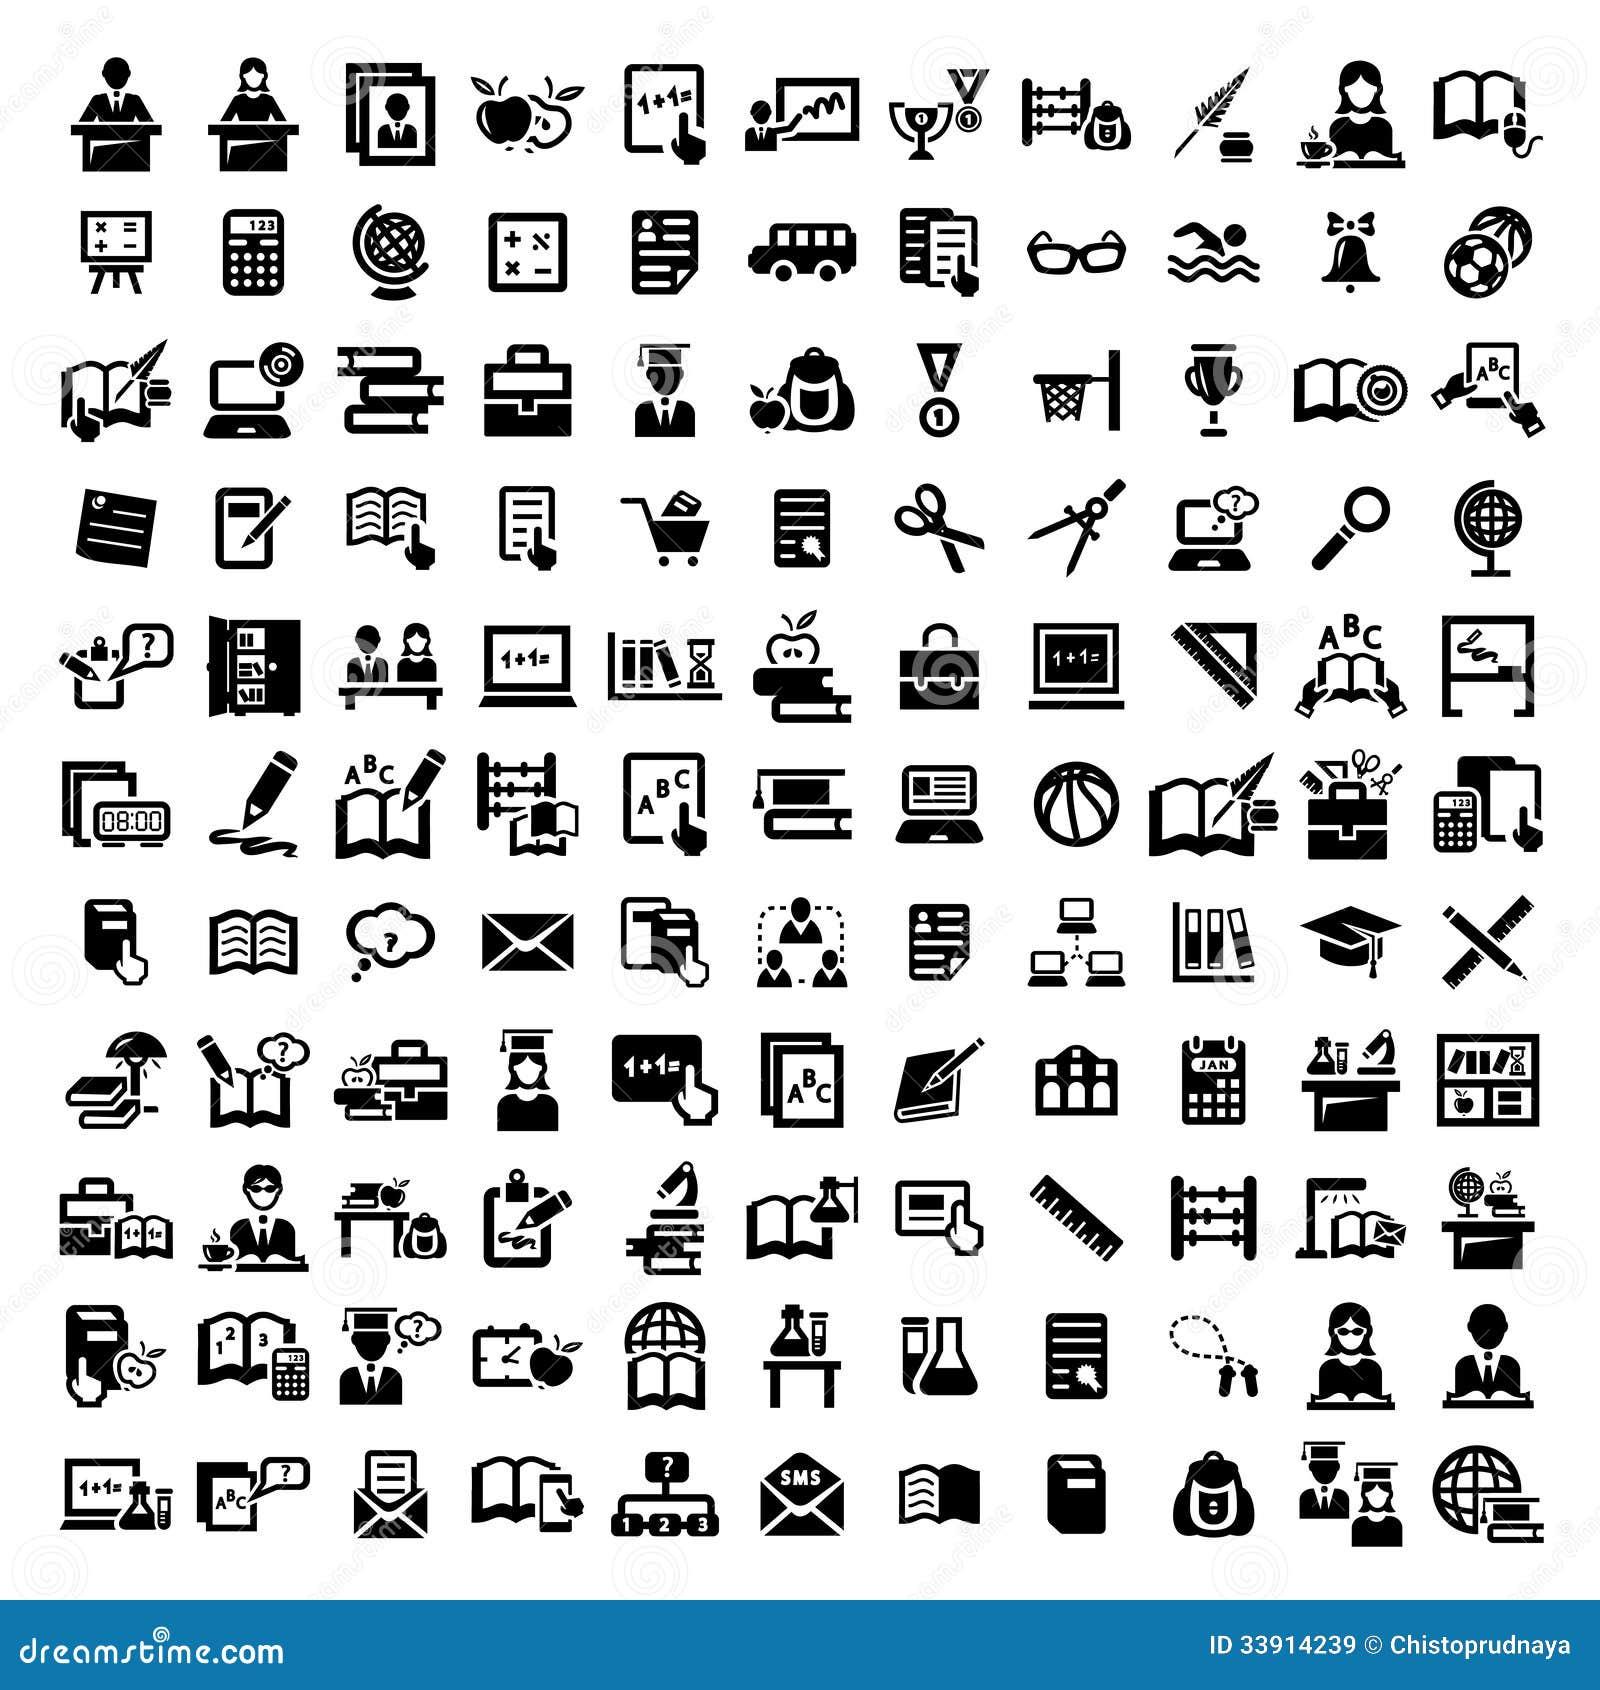 Big education icons set